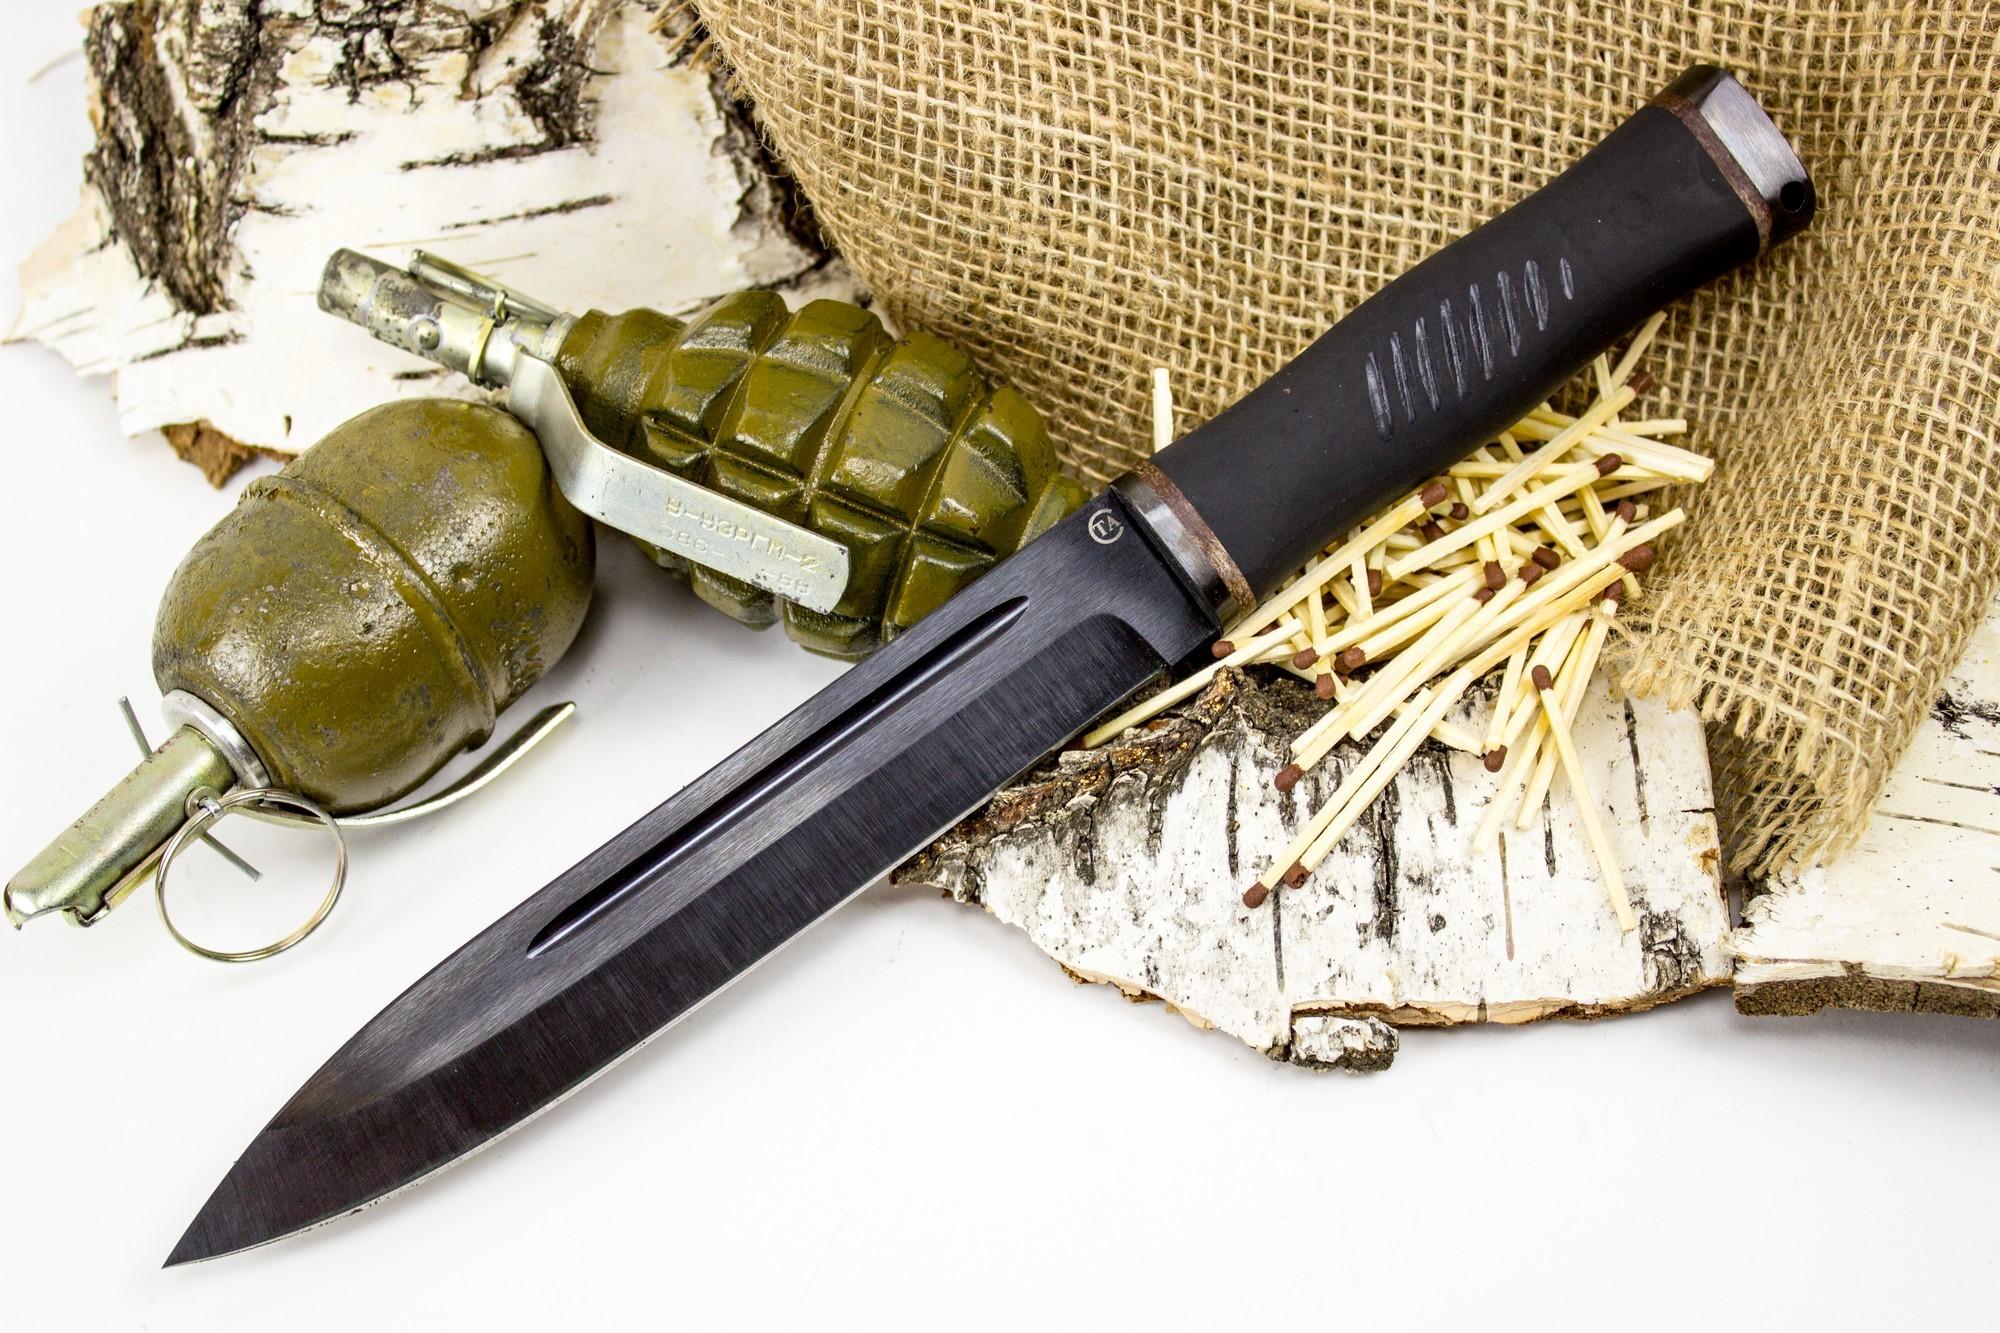 Фото - Нож Горец-2, сталь 65Г, резина от Титов и Солдатова